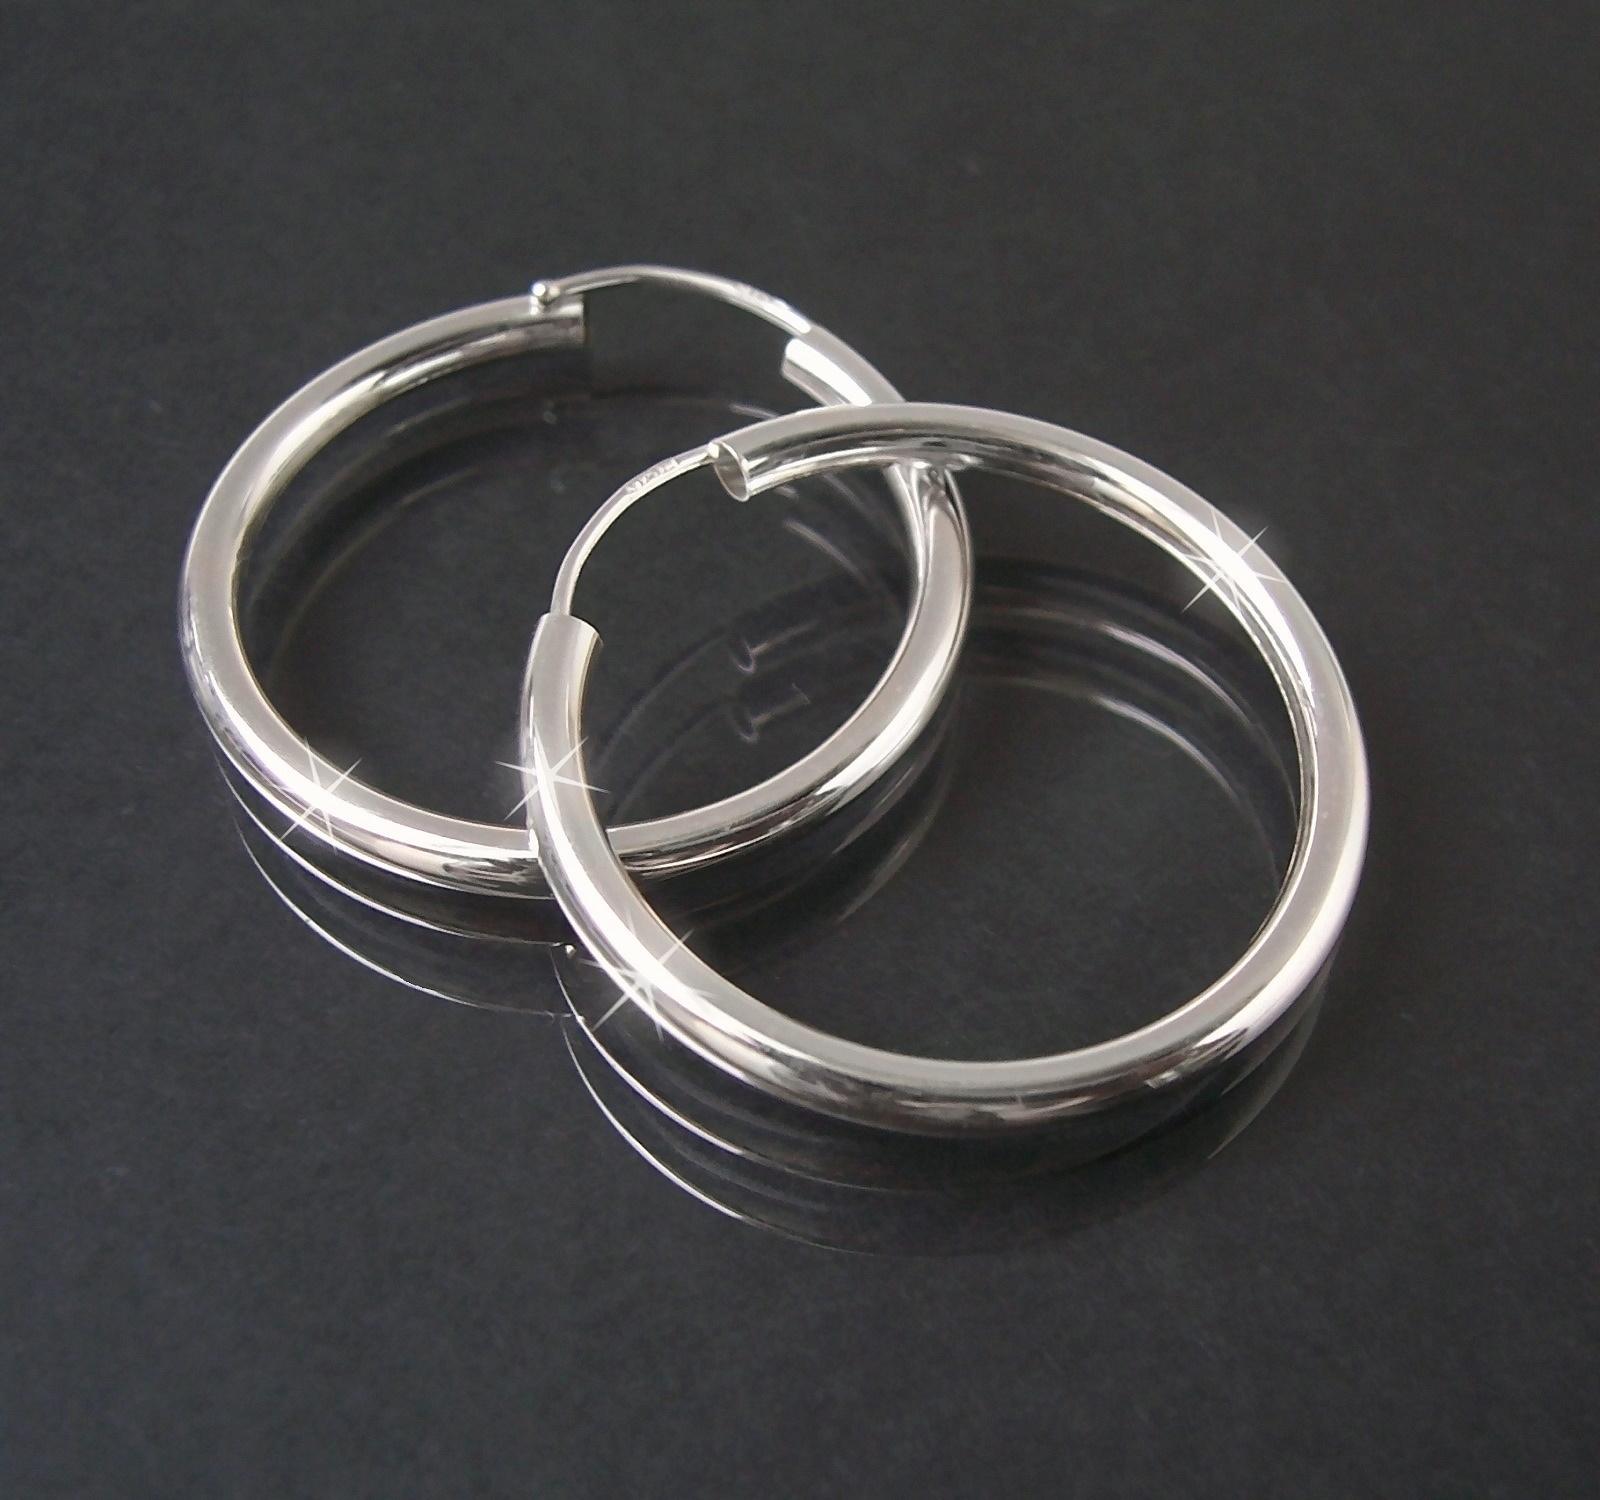 Creolen Silber 925 Niklarson Ohrringe 3cm Rohrcreolen 14125-30